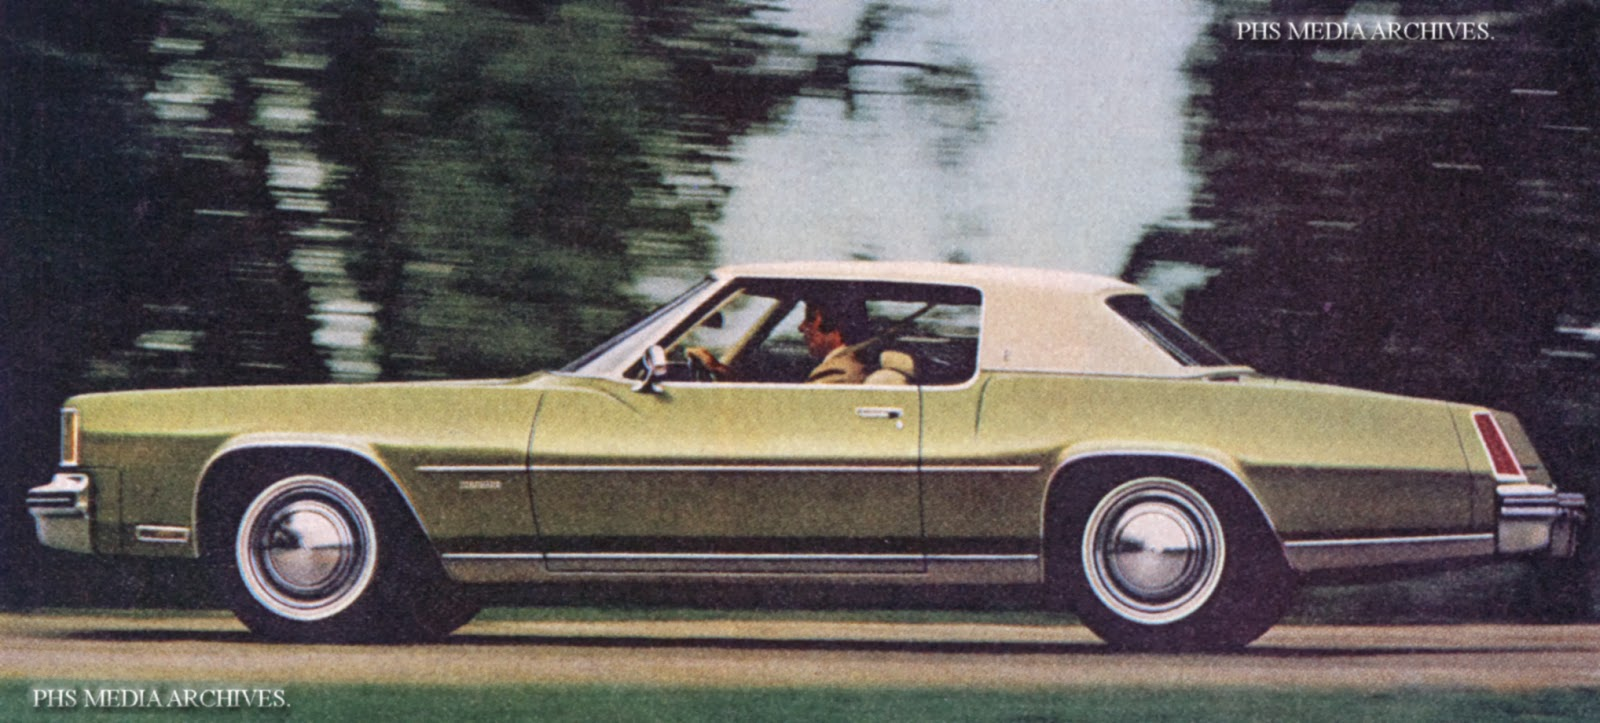 WRG-5047] 1971 Oldsmobile Toronado Wiring Diagrams on